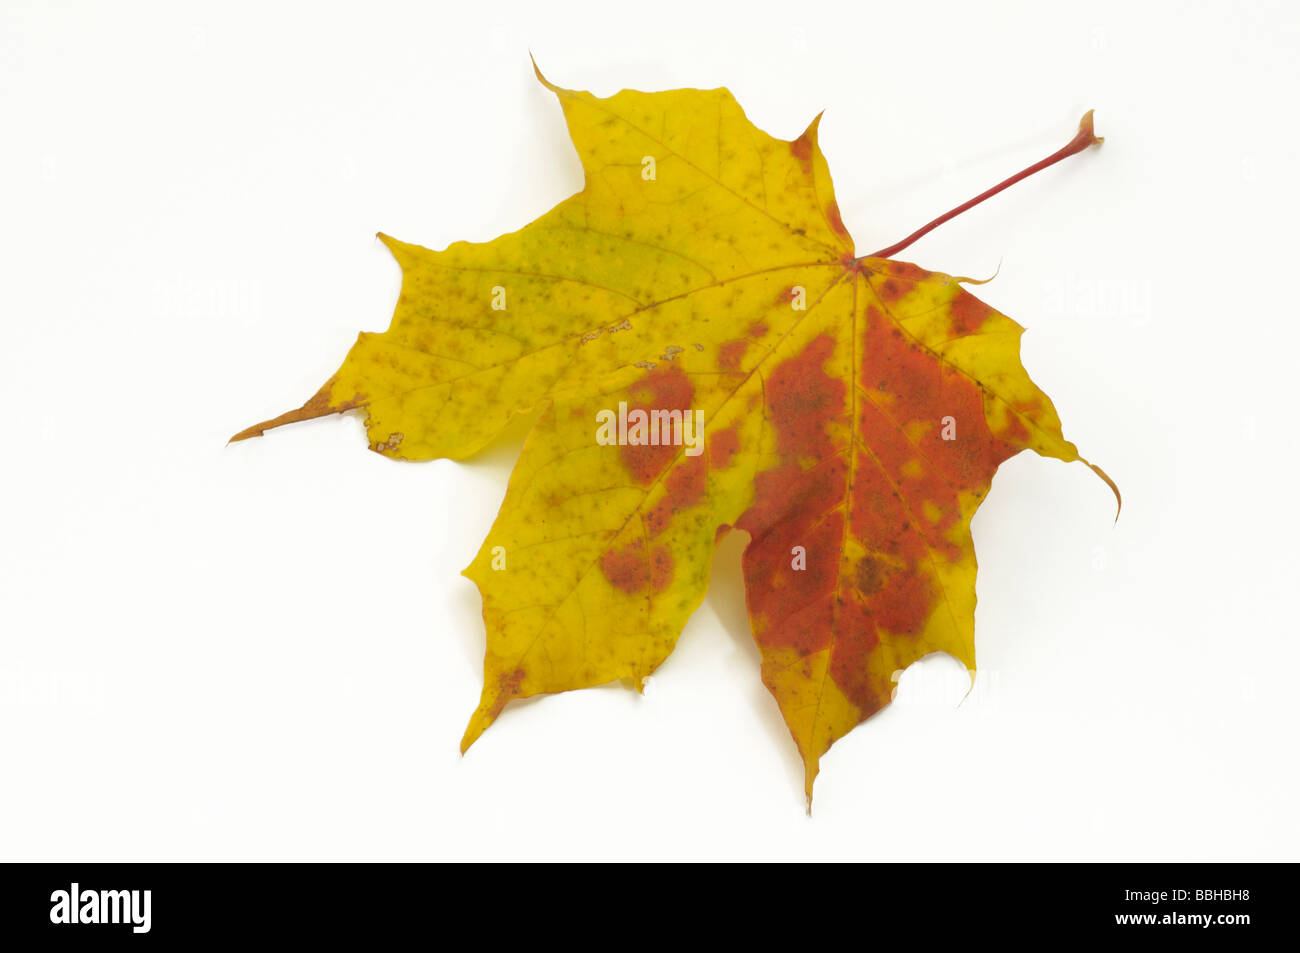 Norway Maple (Acer platanoides), autumn leaf, studio picture - Stock Image